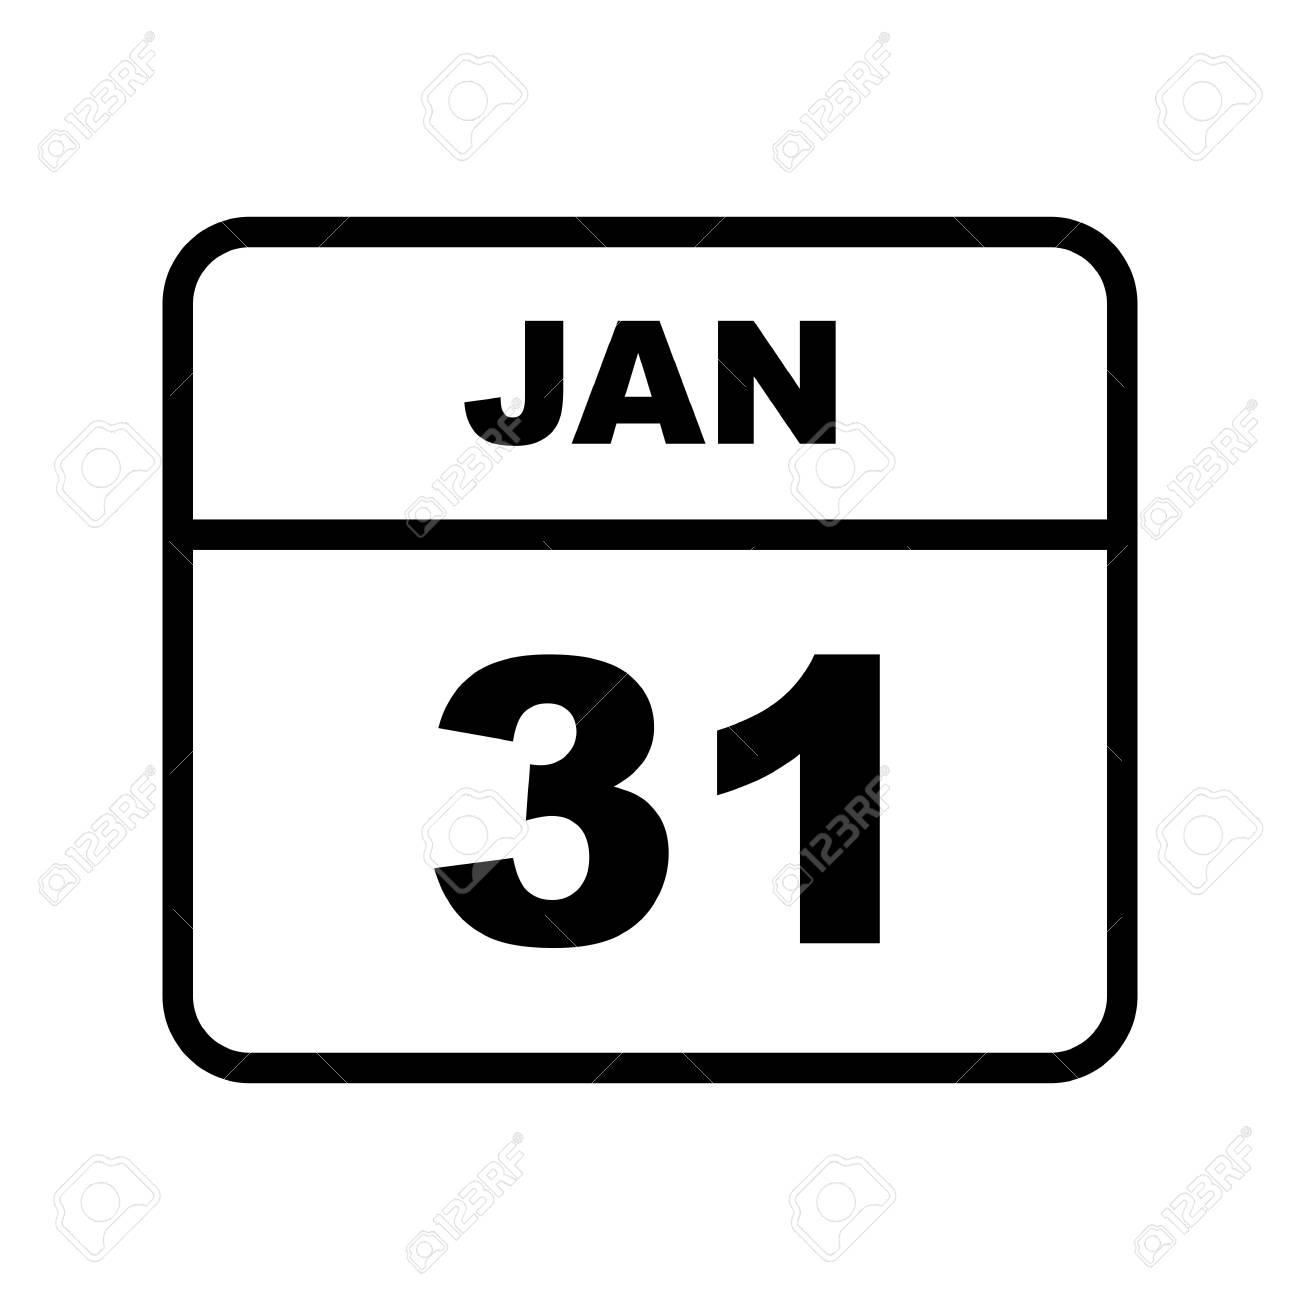 January 31St Date On A Single Day Calendar